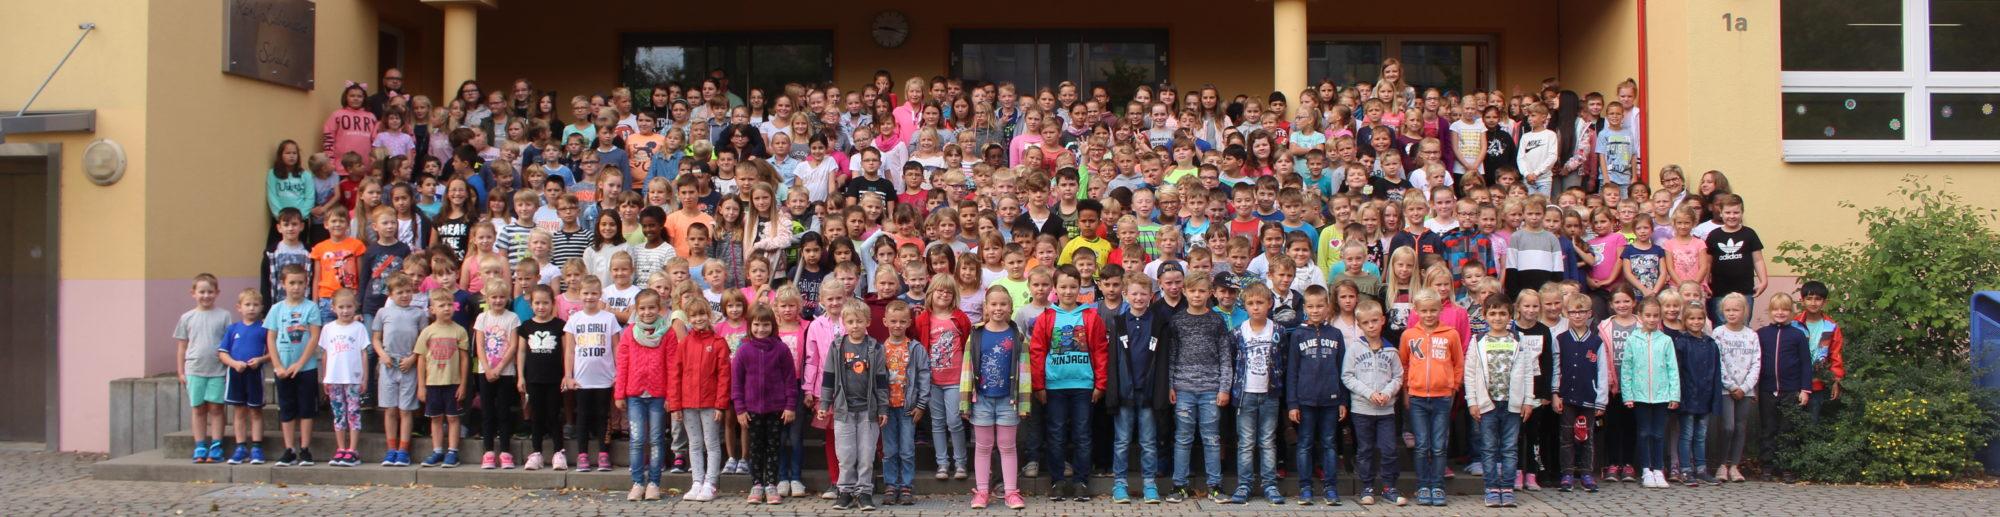 "Grundschule ""Karl Liebknecht"" Neuruppin"